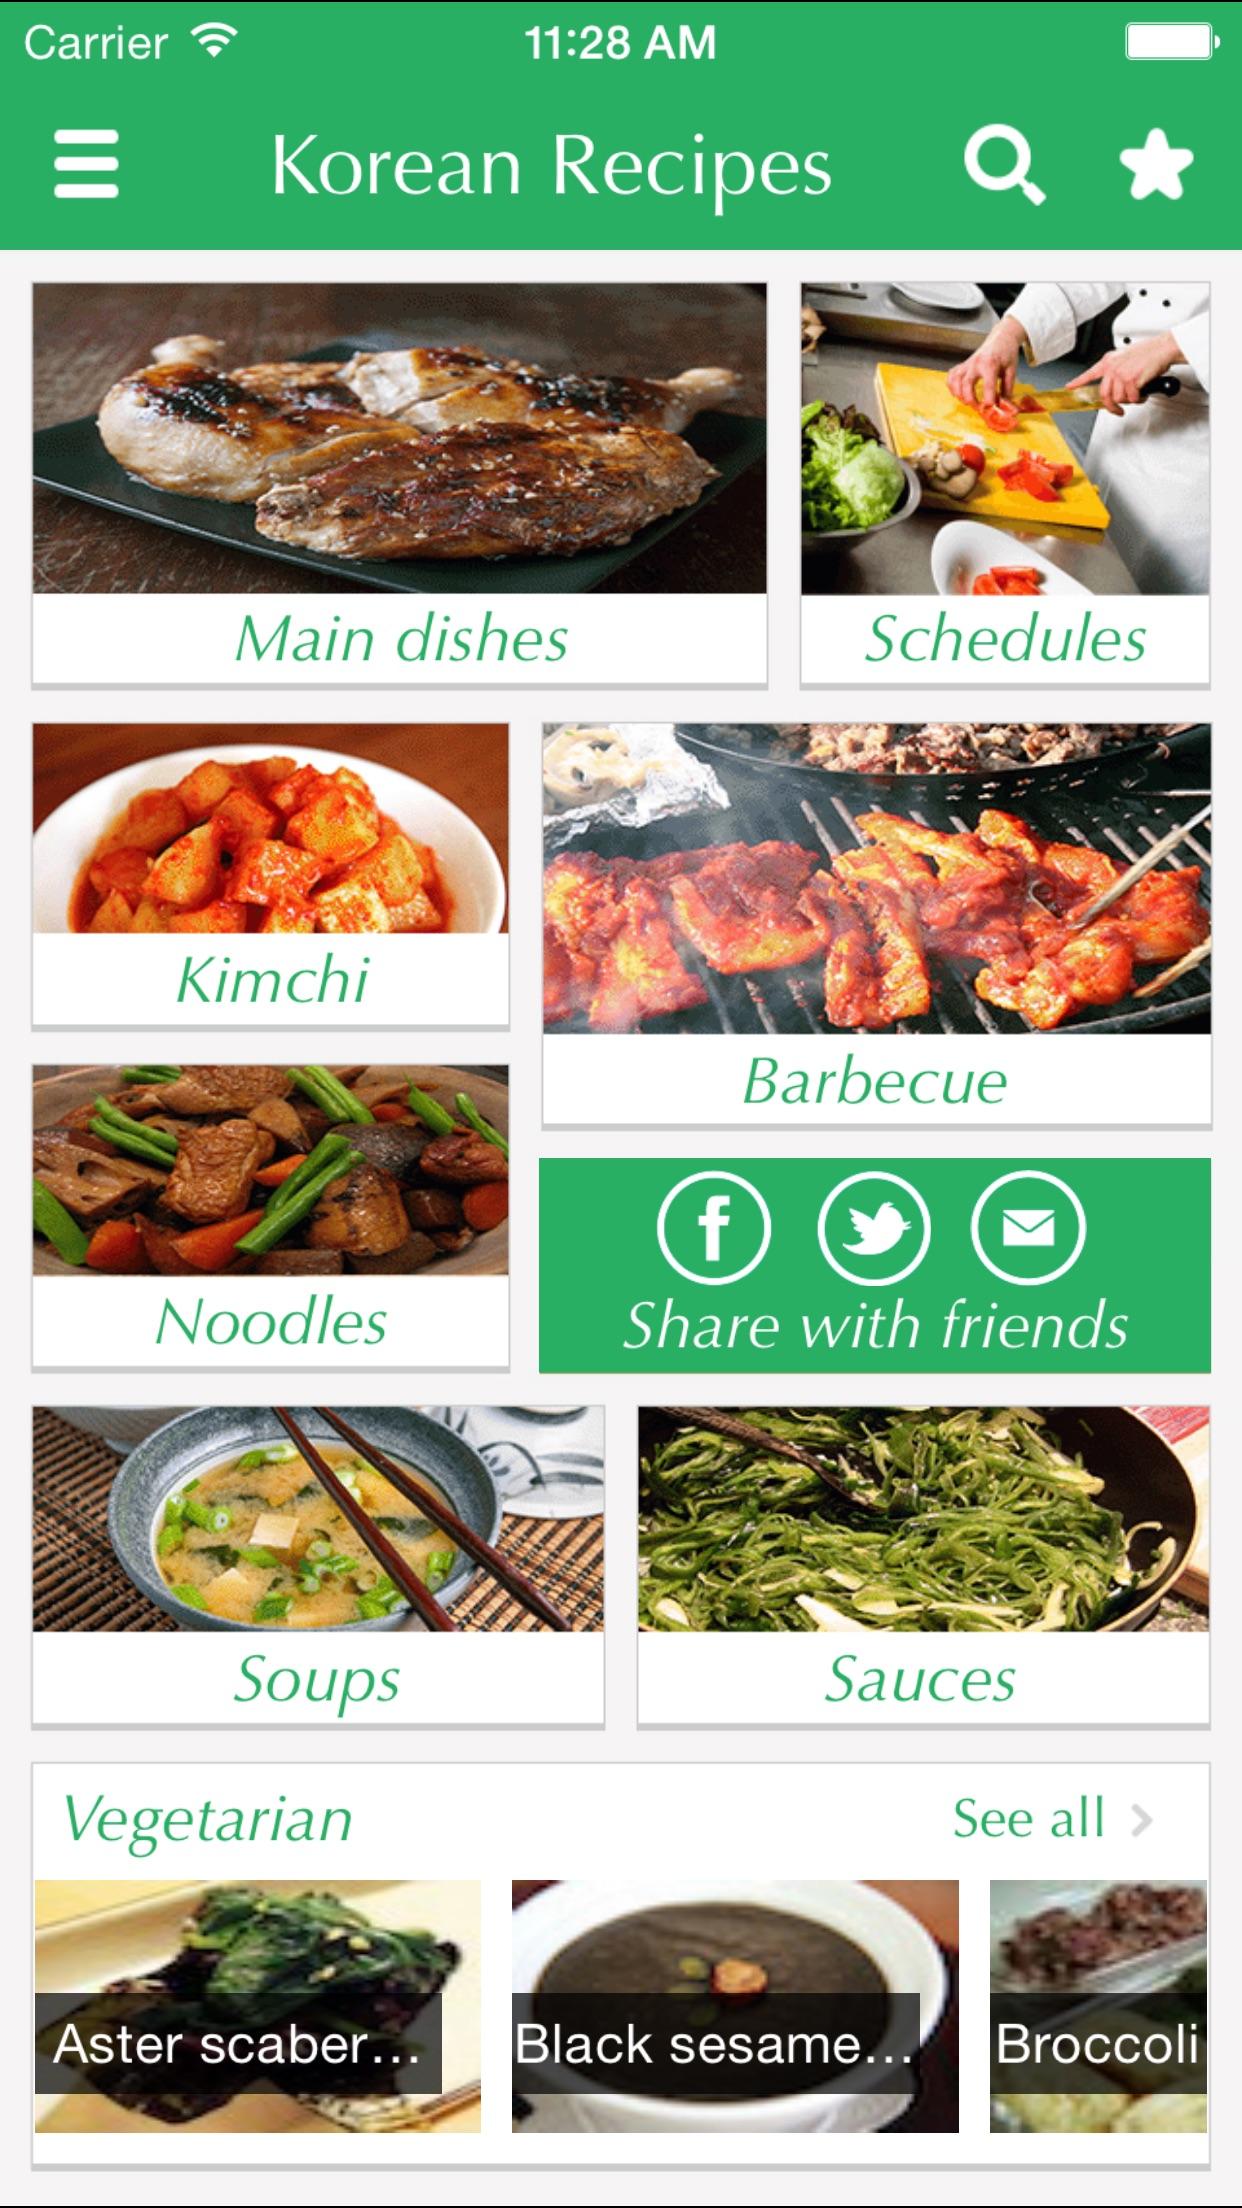 Korean Food Recipes - best cooking tips, ideas Screenshot